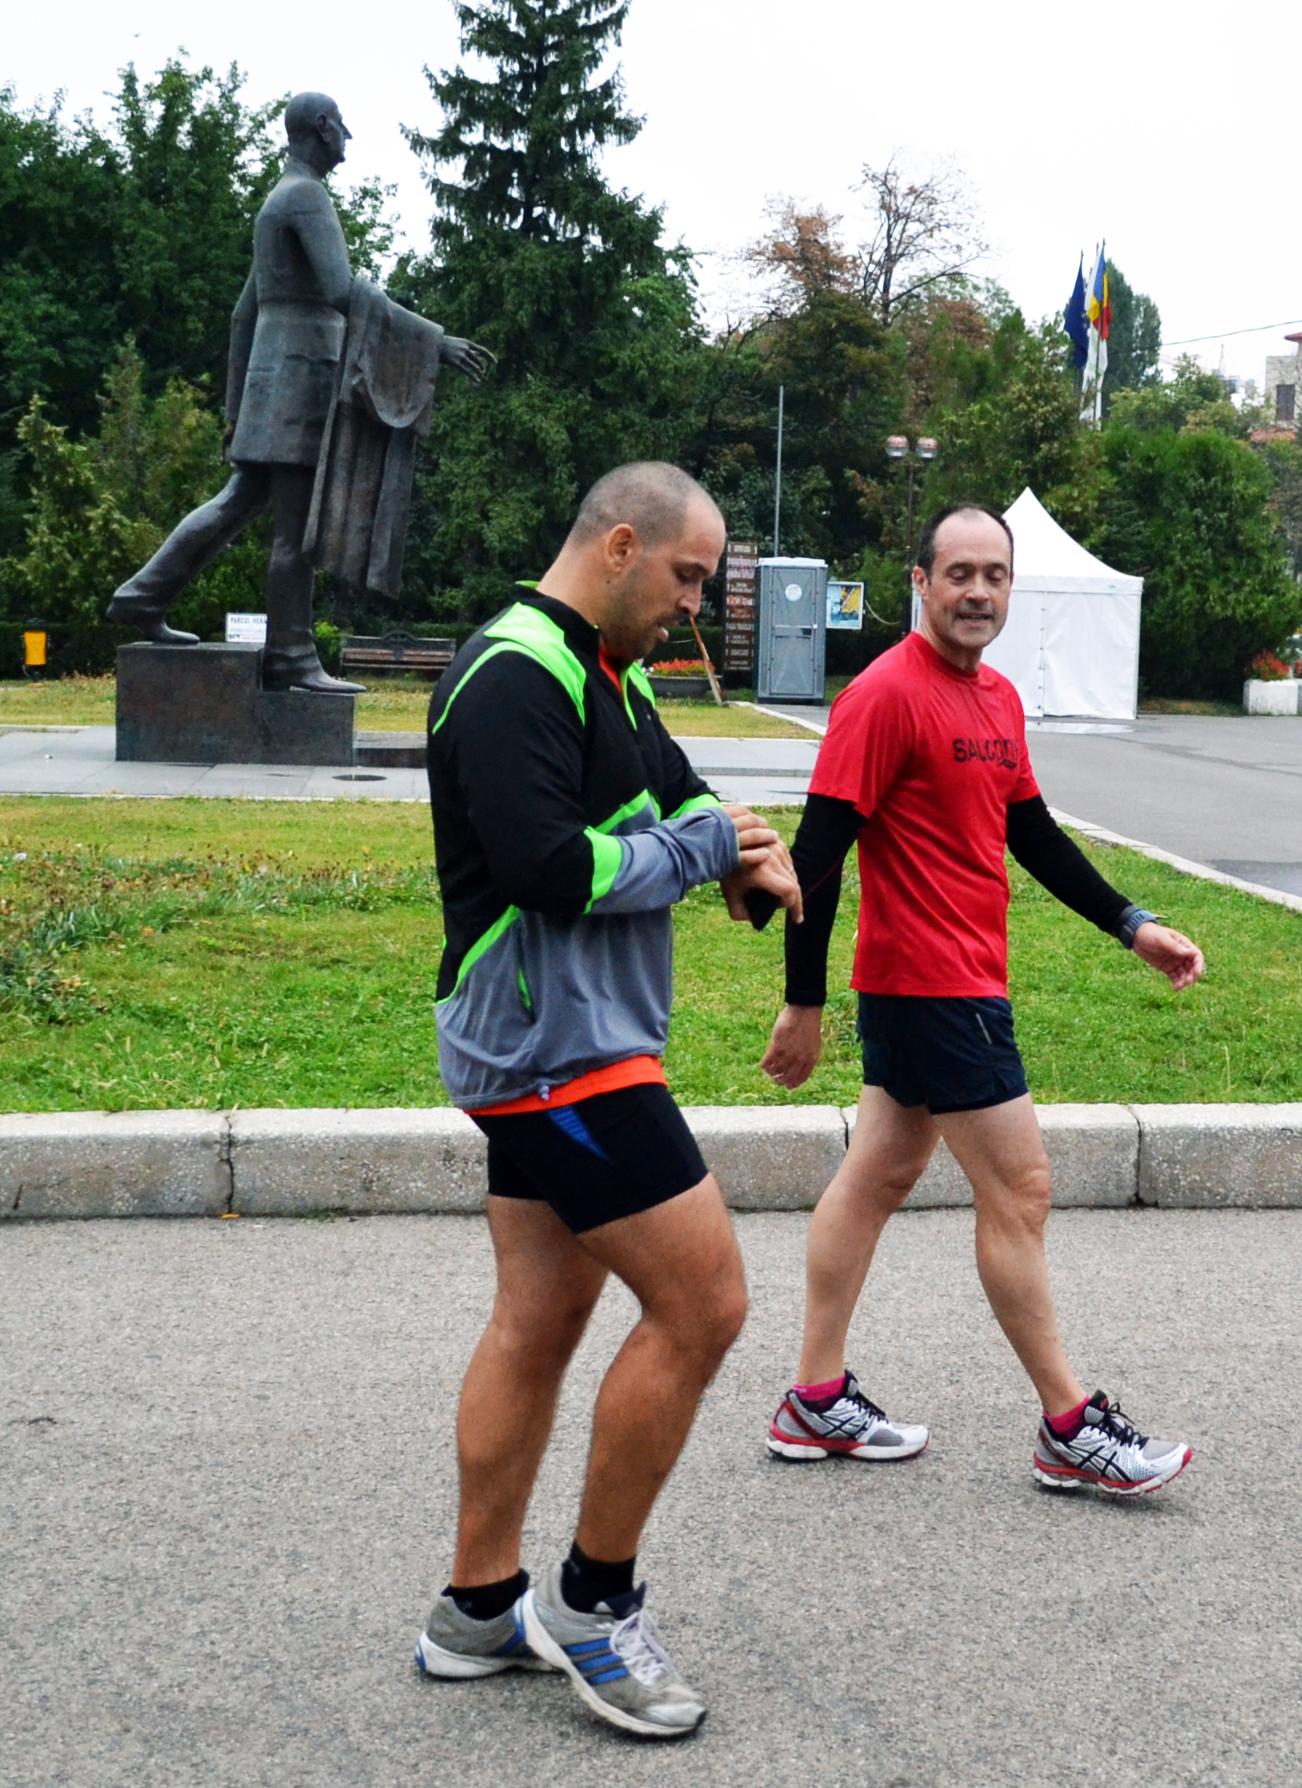 Inaki Berroeta - alergare finish Herastrau